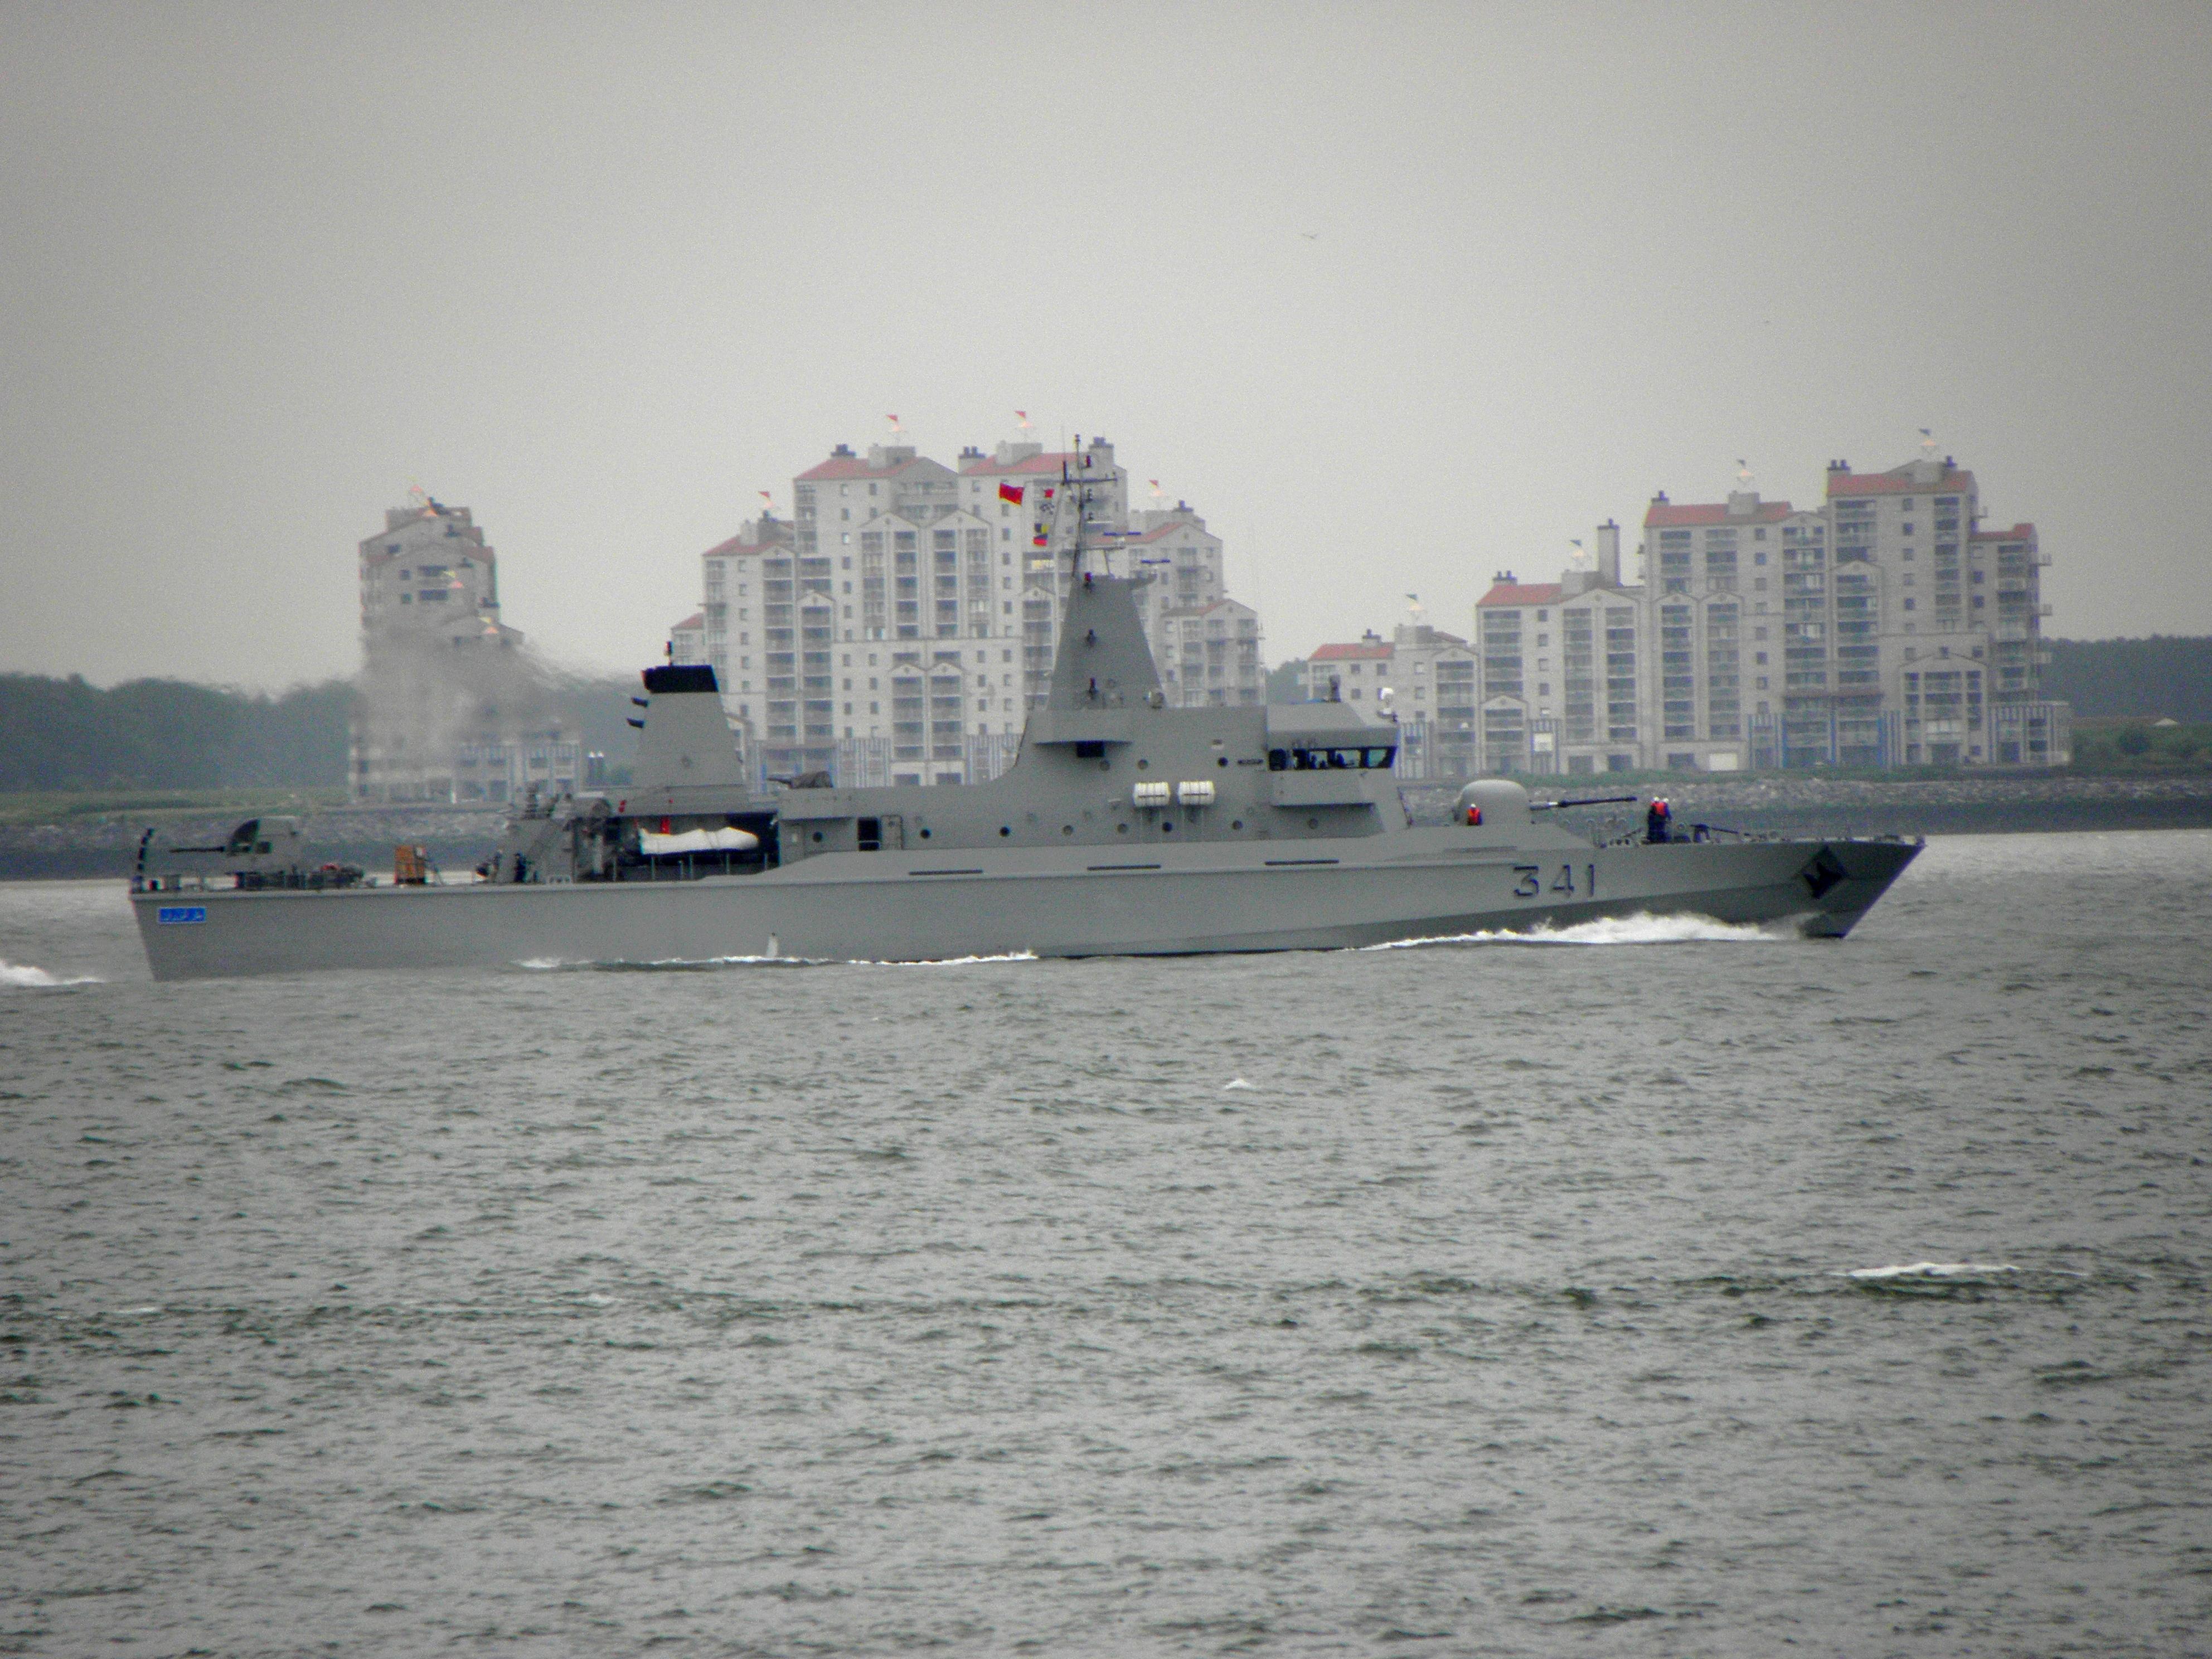 Royal Moroccan Navy OPV-70 / Classe Bir Anzarane - Page 5 Moroccan_patrol_vessel_opv_70_bir_anzarane__p341__by_dolfijn1962-daak2iy